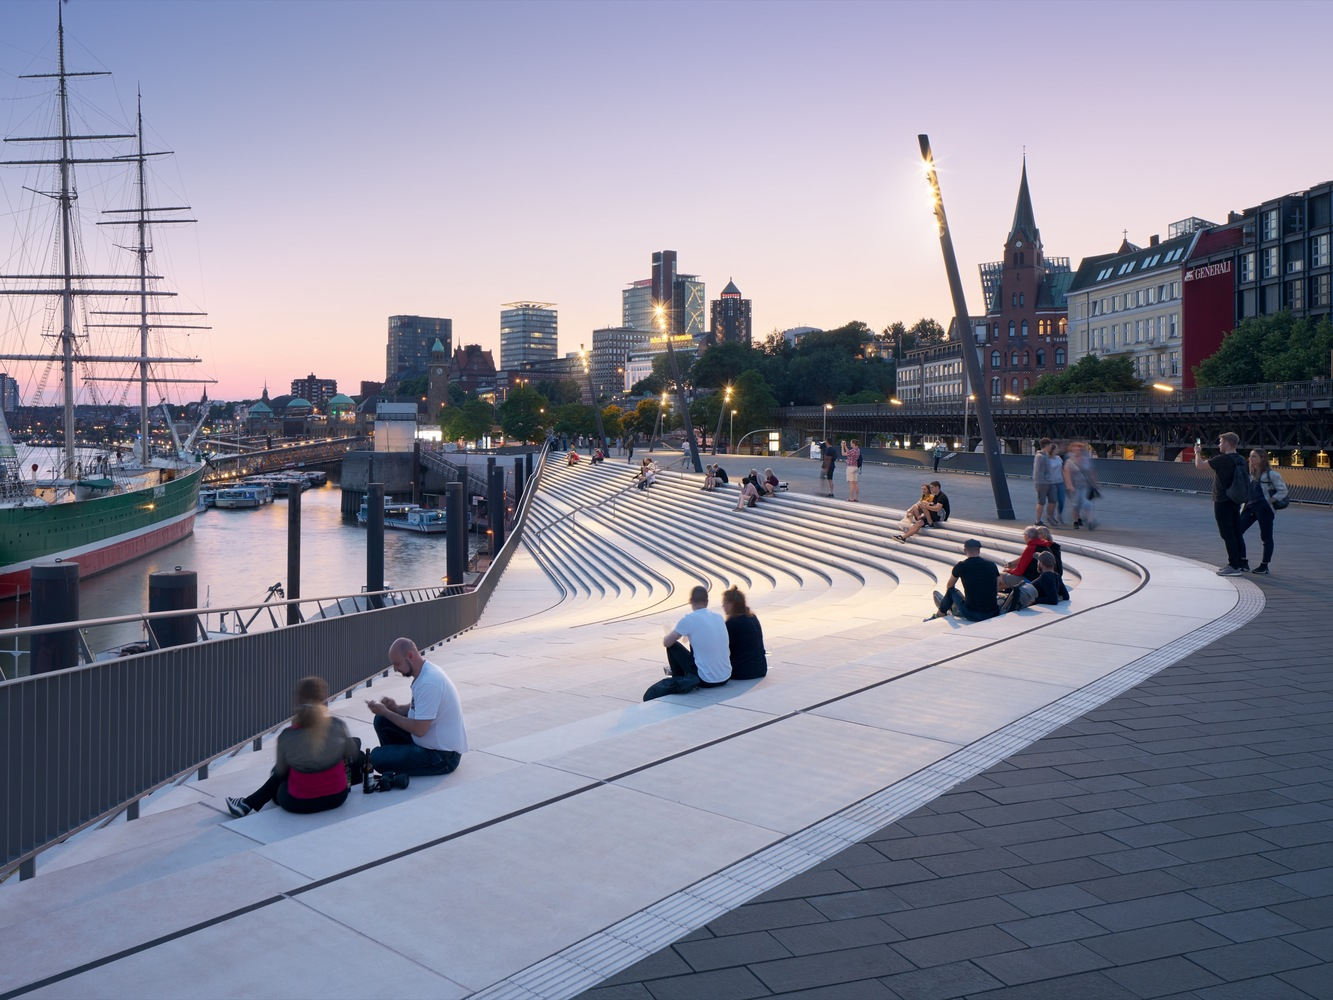 Zaha Hadid Architects Make Flood Protection Look Elegant in Hamburg